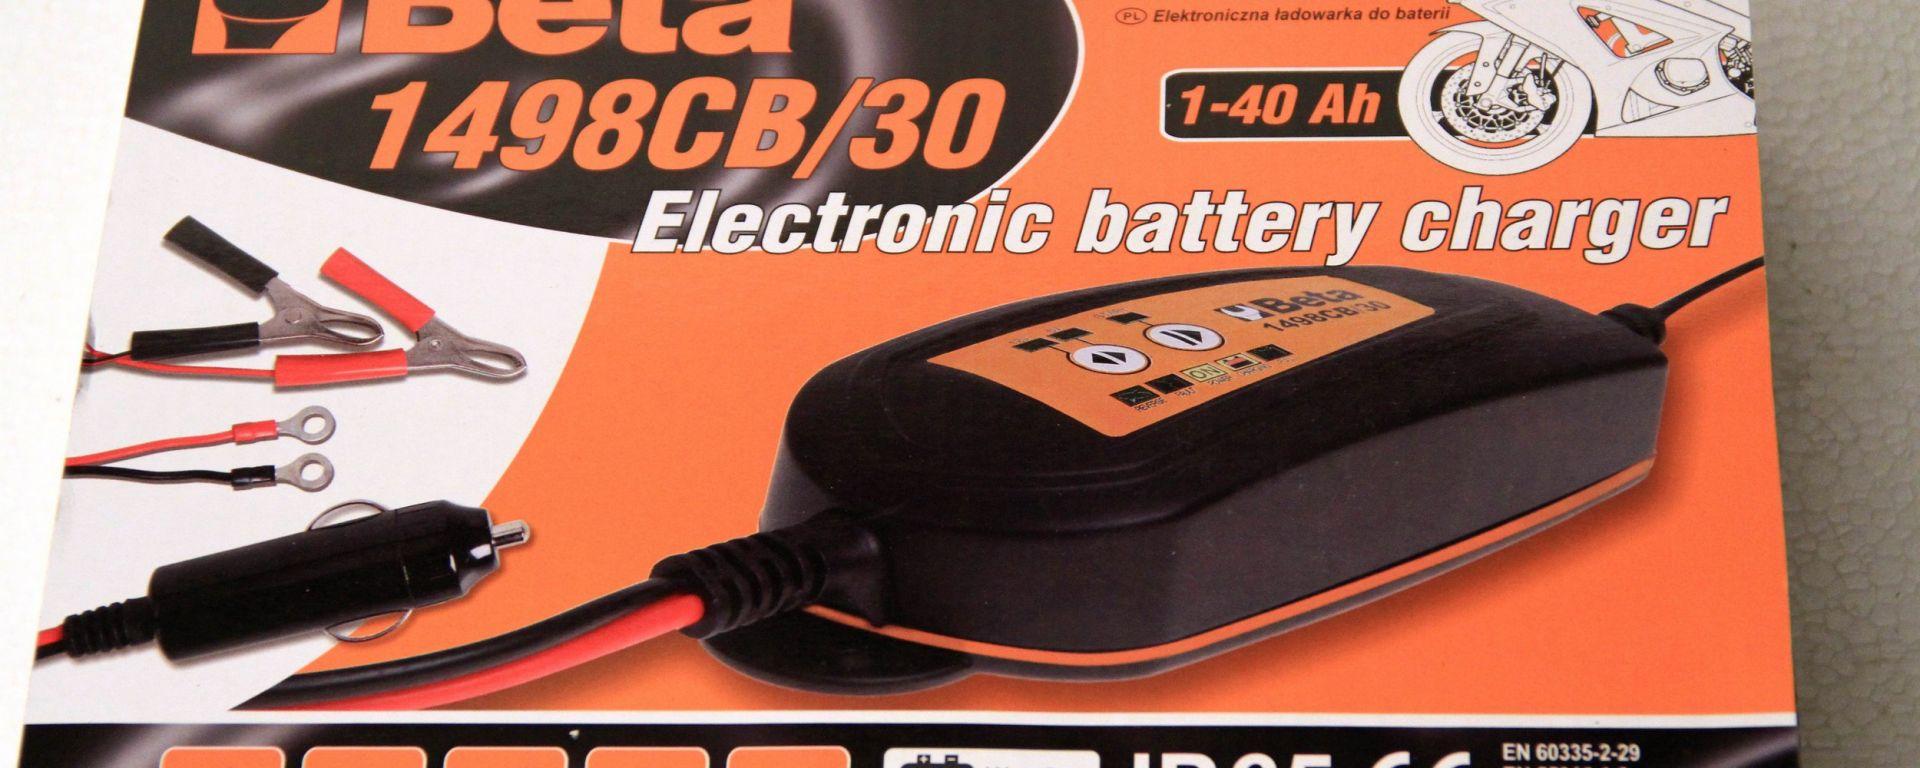 Beta 1498 CB/30